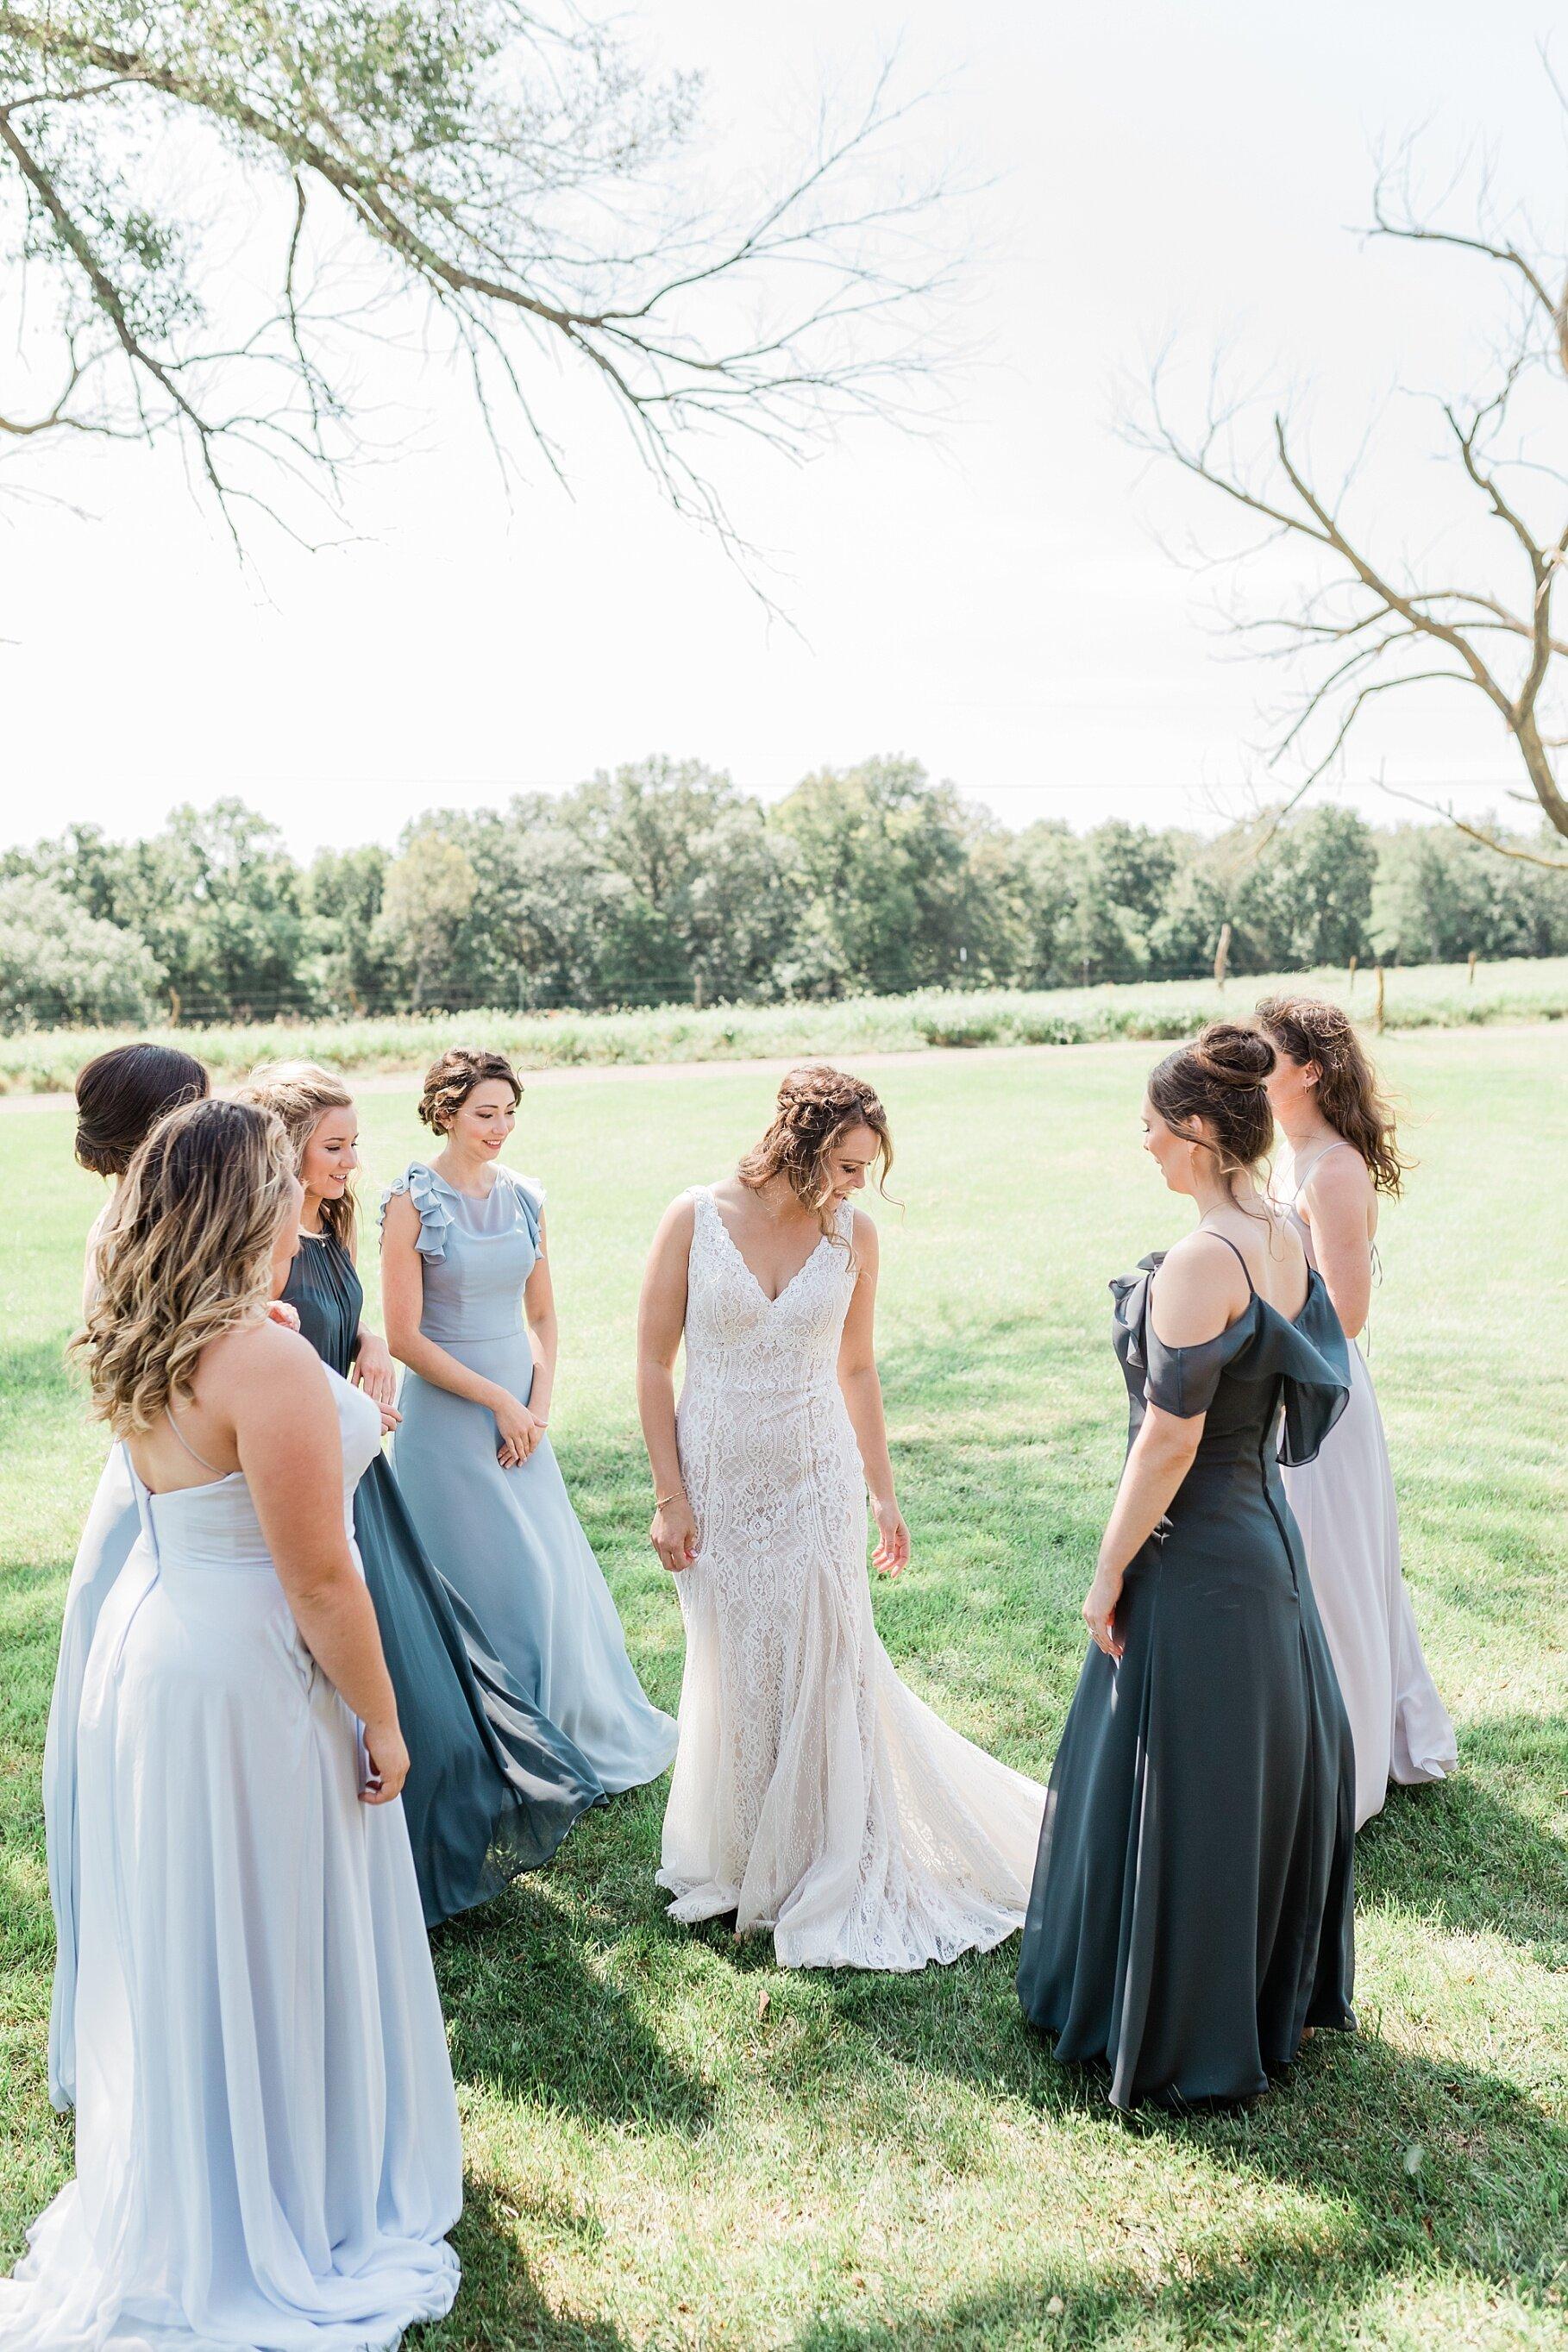 Earth-Toned Wedding by KKP Associate Wedding Photographer and Kelsi Kliethermes Photography Best Columbia Missouri Wedding Photographer_0043.jpg